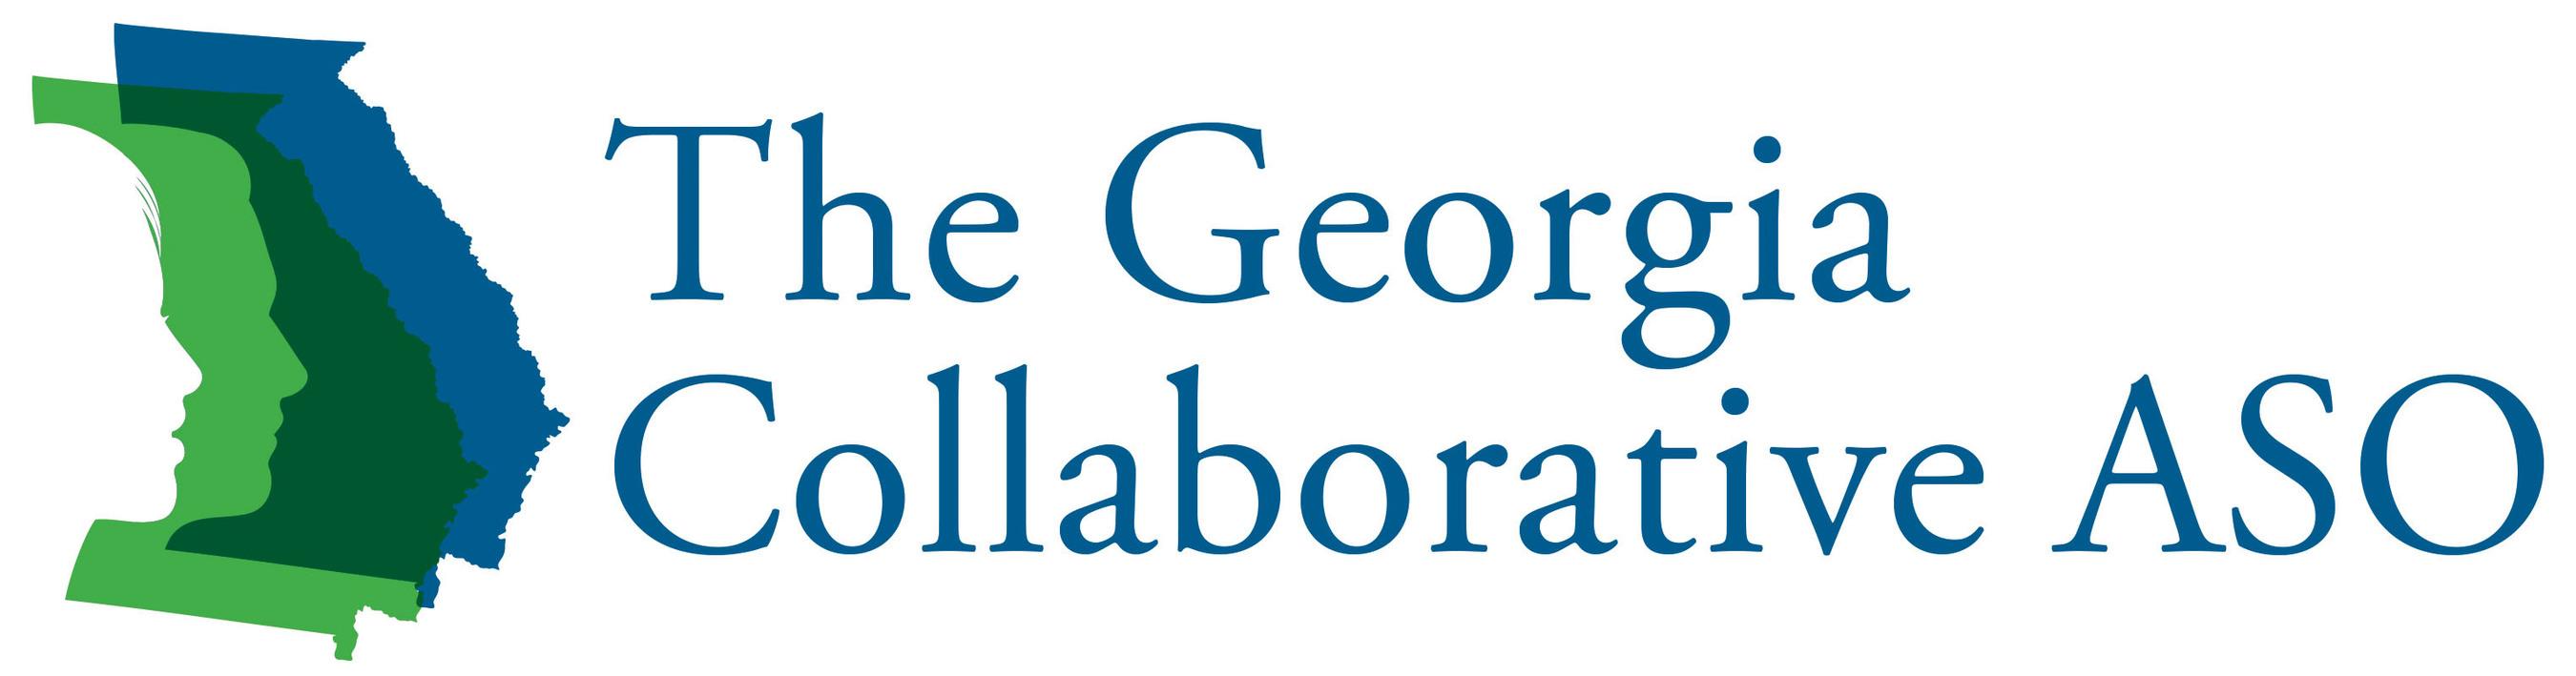 Georgia Collaborative ASO logo